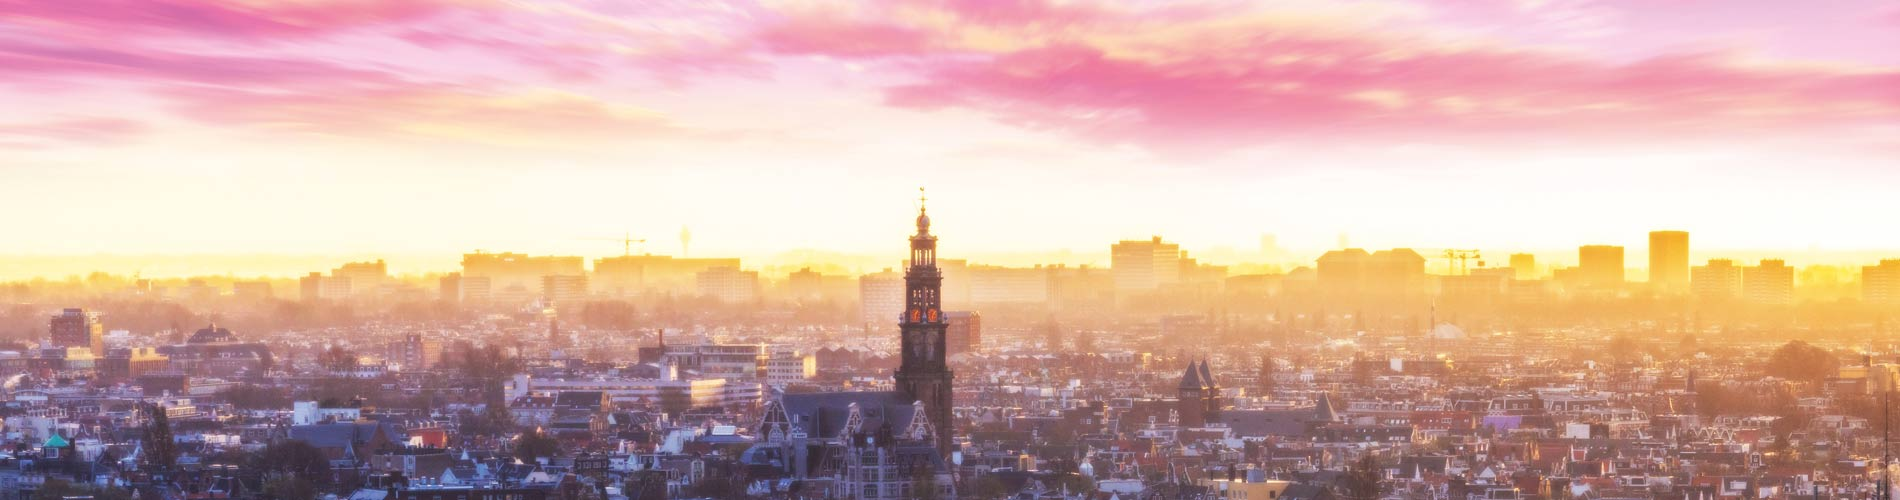 Blog_AmsterdamGuide_SunsetSpotting_1900x500_Q120